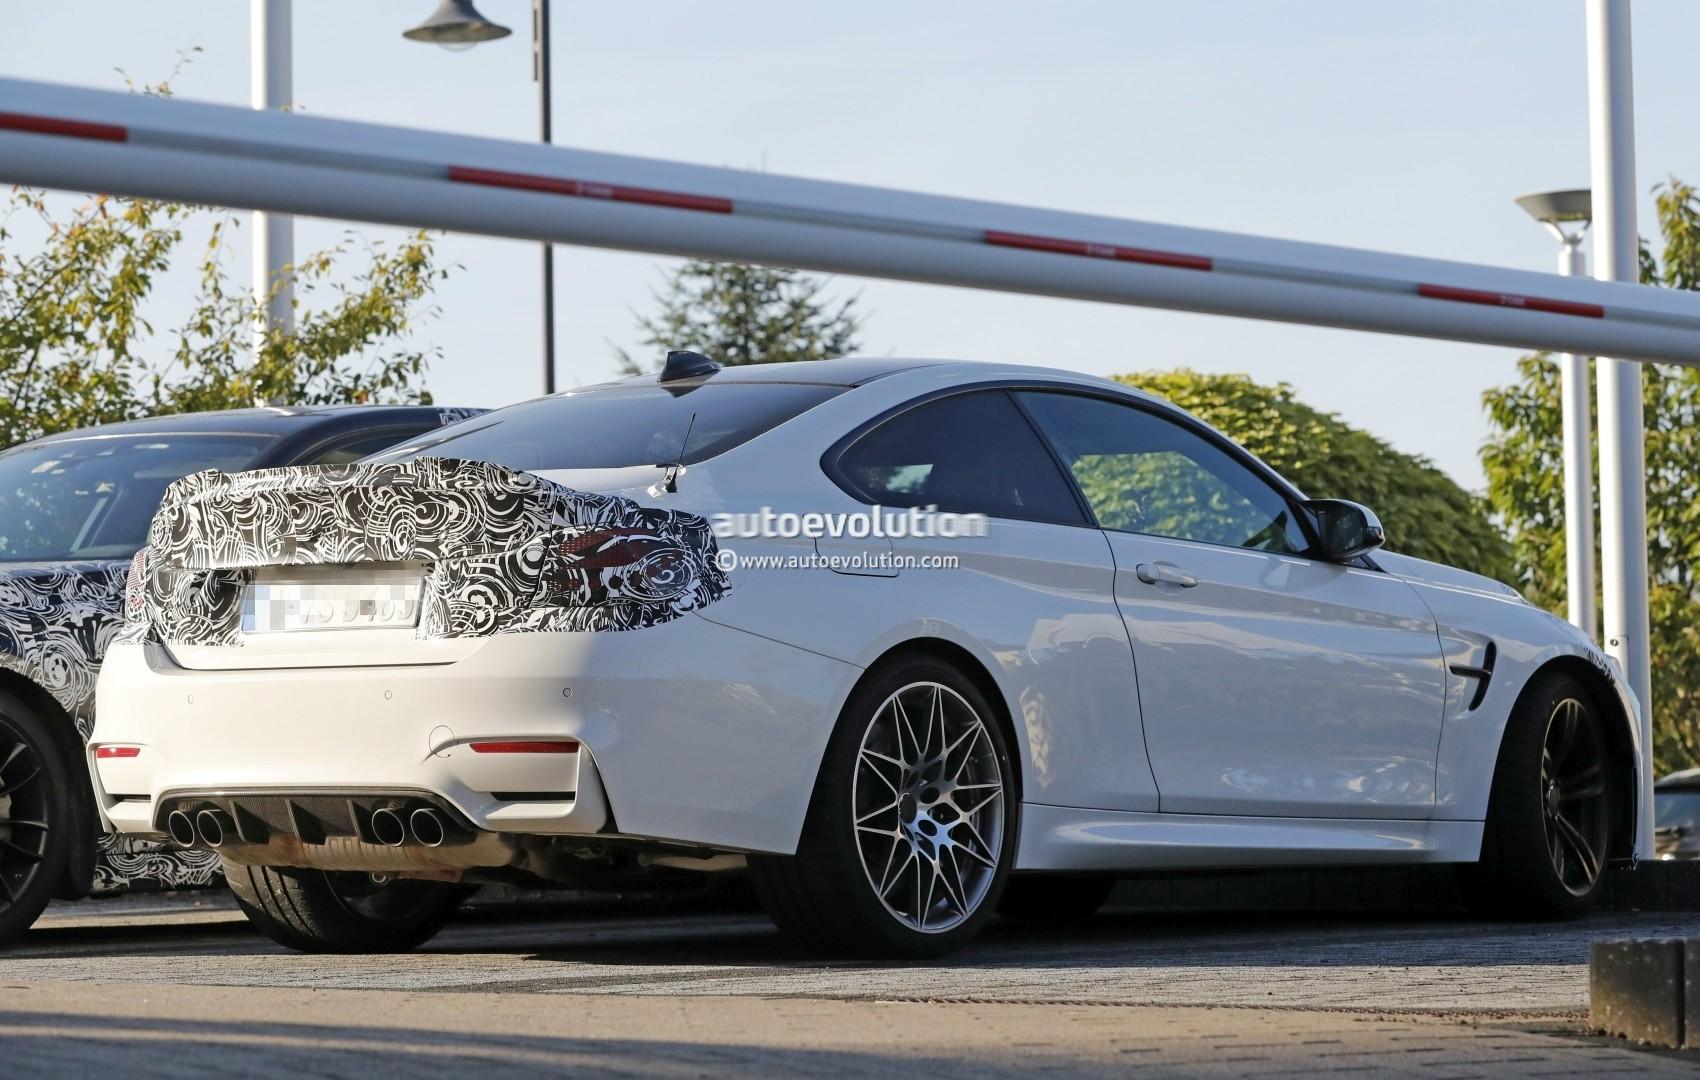 2014 - [BMW] M3 & M4 [F80/F82/F83] - Page 24 2018-bmw-m4-facelift-cs-special-edition-spied-shows-aggressive-aerodynamics_11